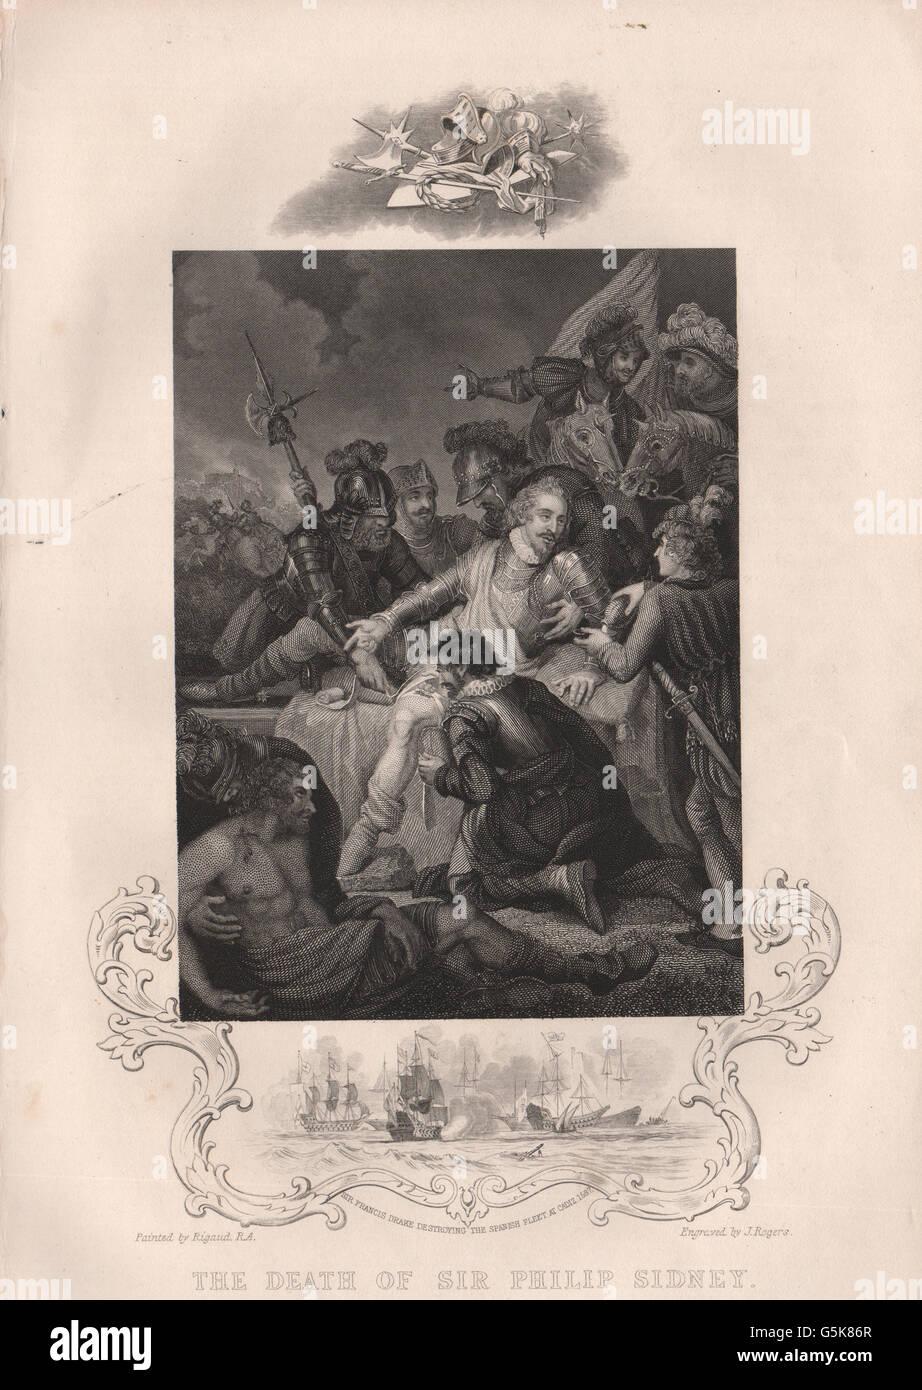 BATTLE OF ZUTPHEN: Sir Philip Sidney's death. Francis Drake at Cadiz 1587, 1853 - Stock Image